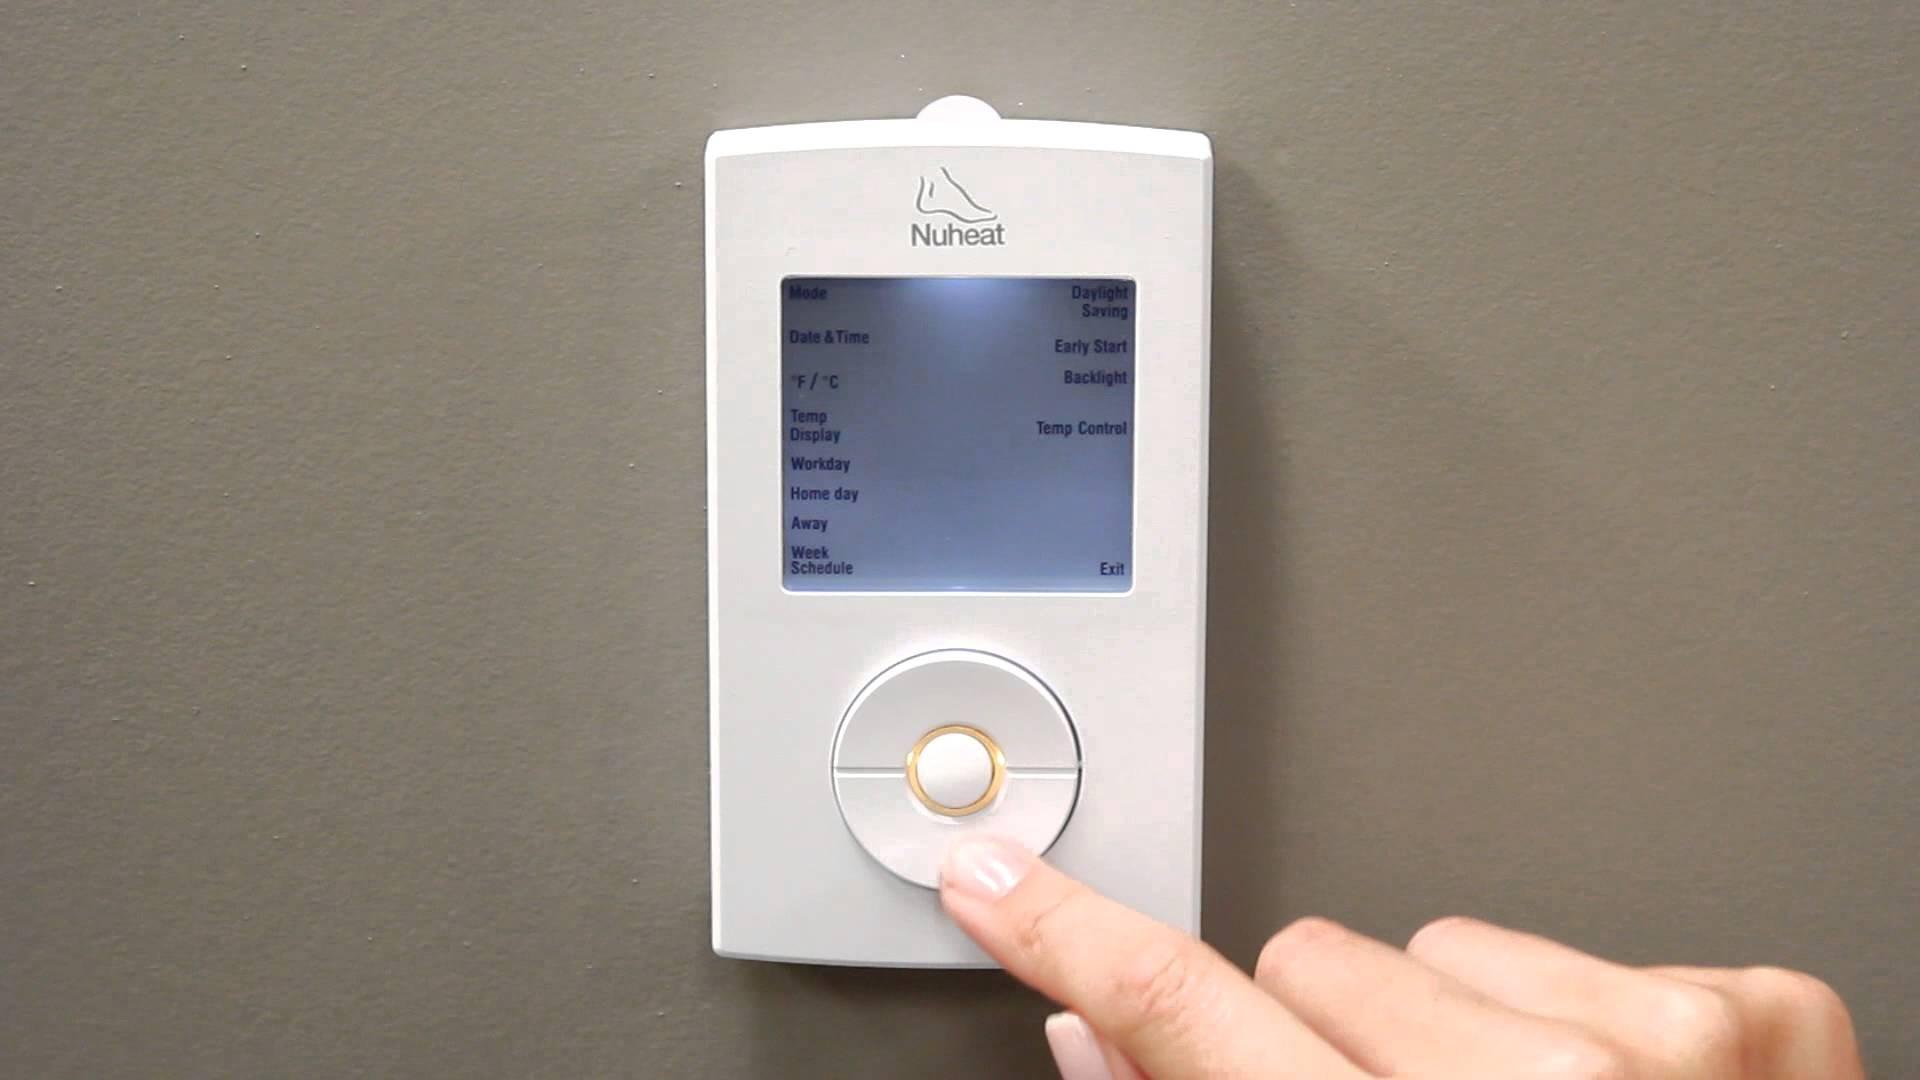 Nuheat home wiring diagram wiring data nuheat solo thermostat wiring diagram 4k wiki wallpapers 2018 air conditioner wiring diagrams nuheat home wiring diagram swarovskicordoba Gallery